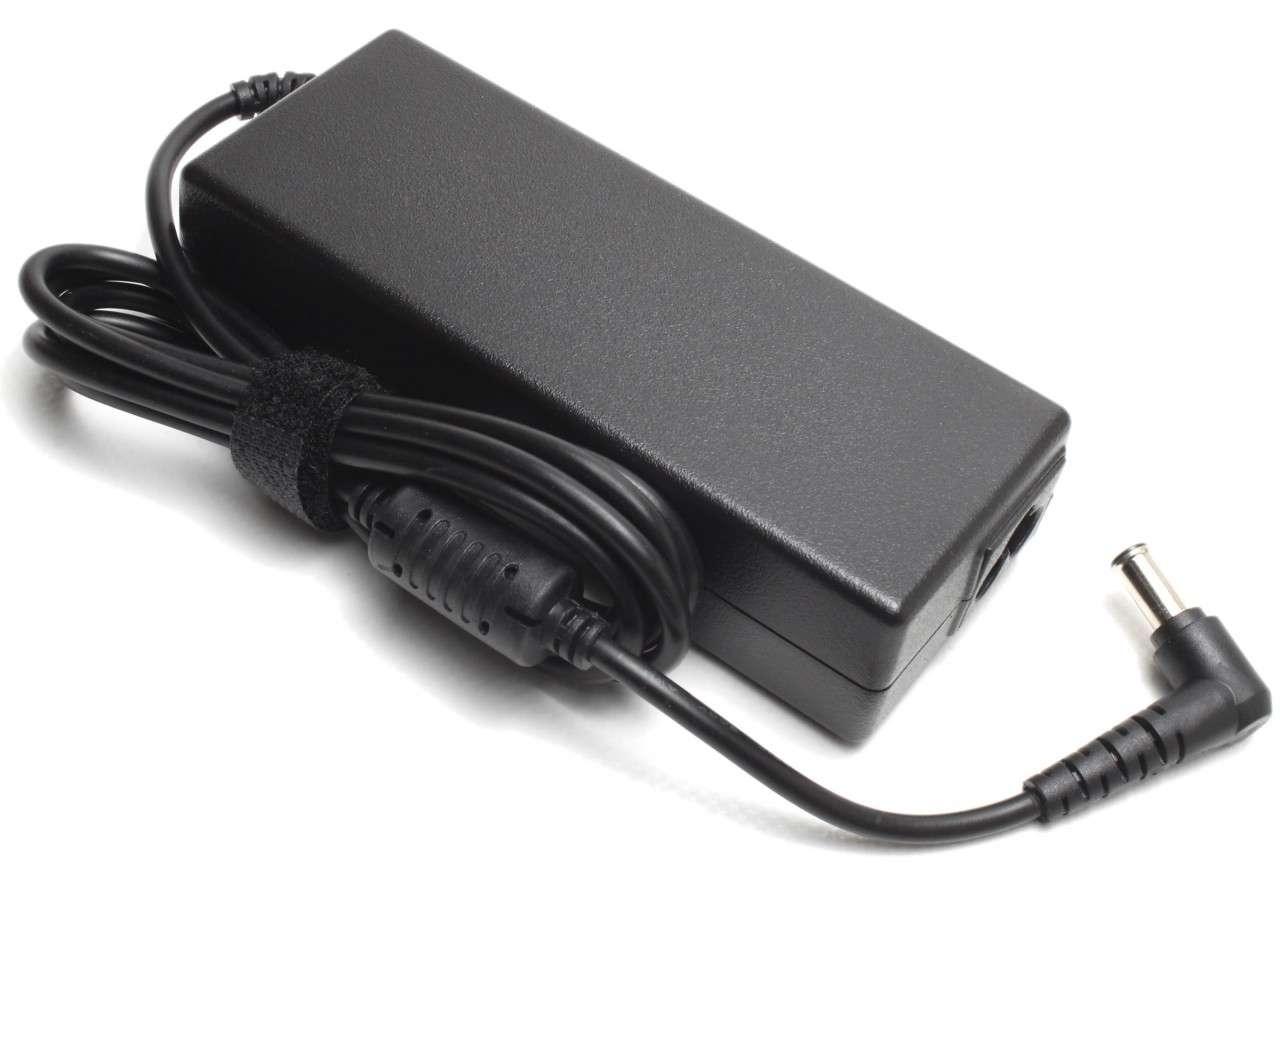 Incarcator Sony Vaio VPCM121AX Replacement imagine powerlaptop.ro 2021